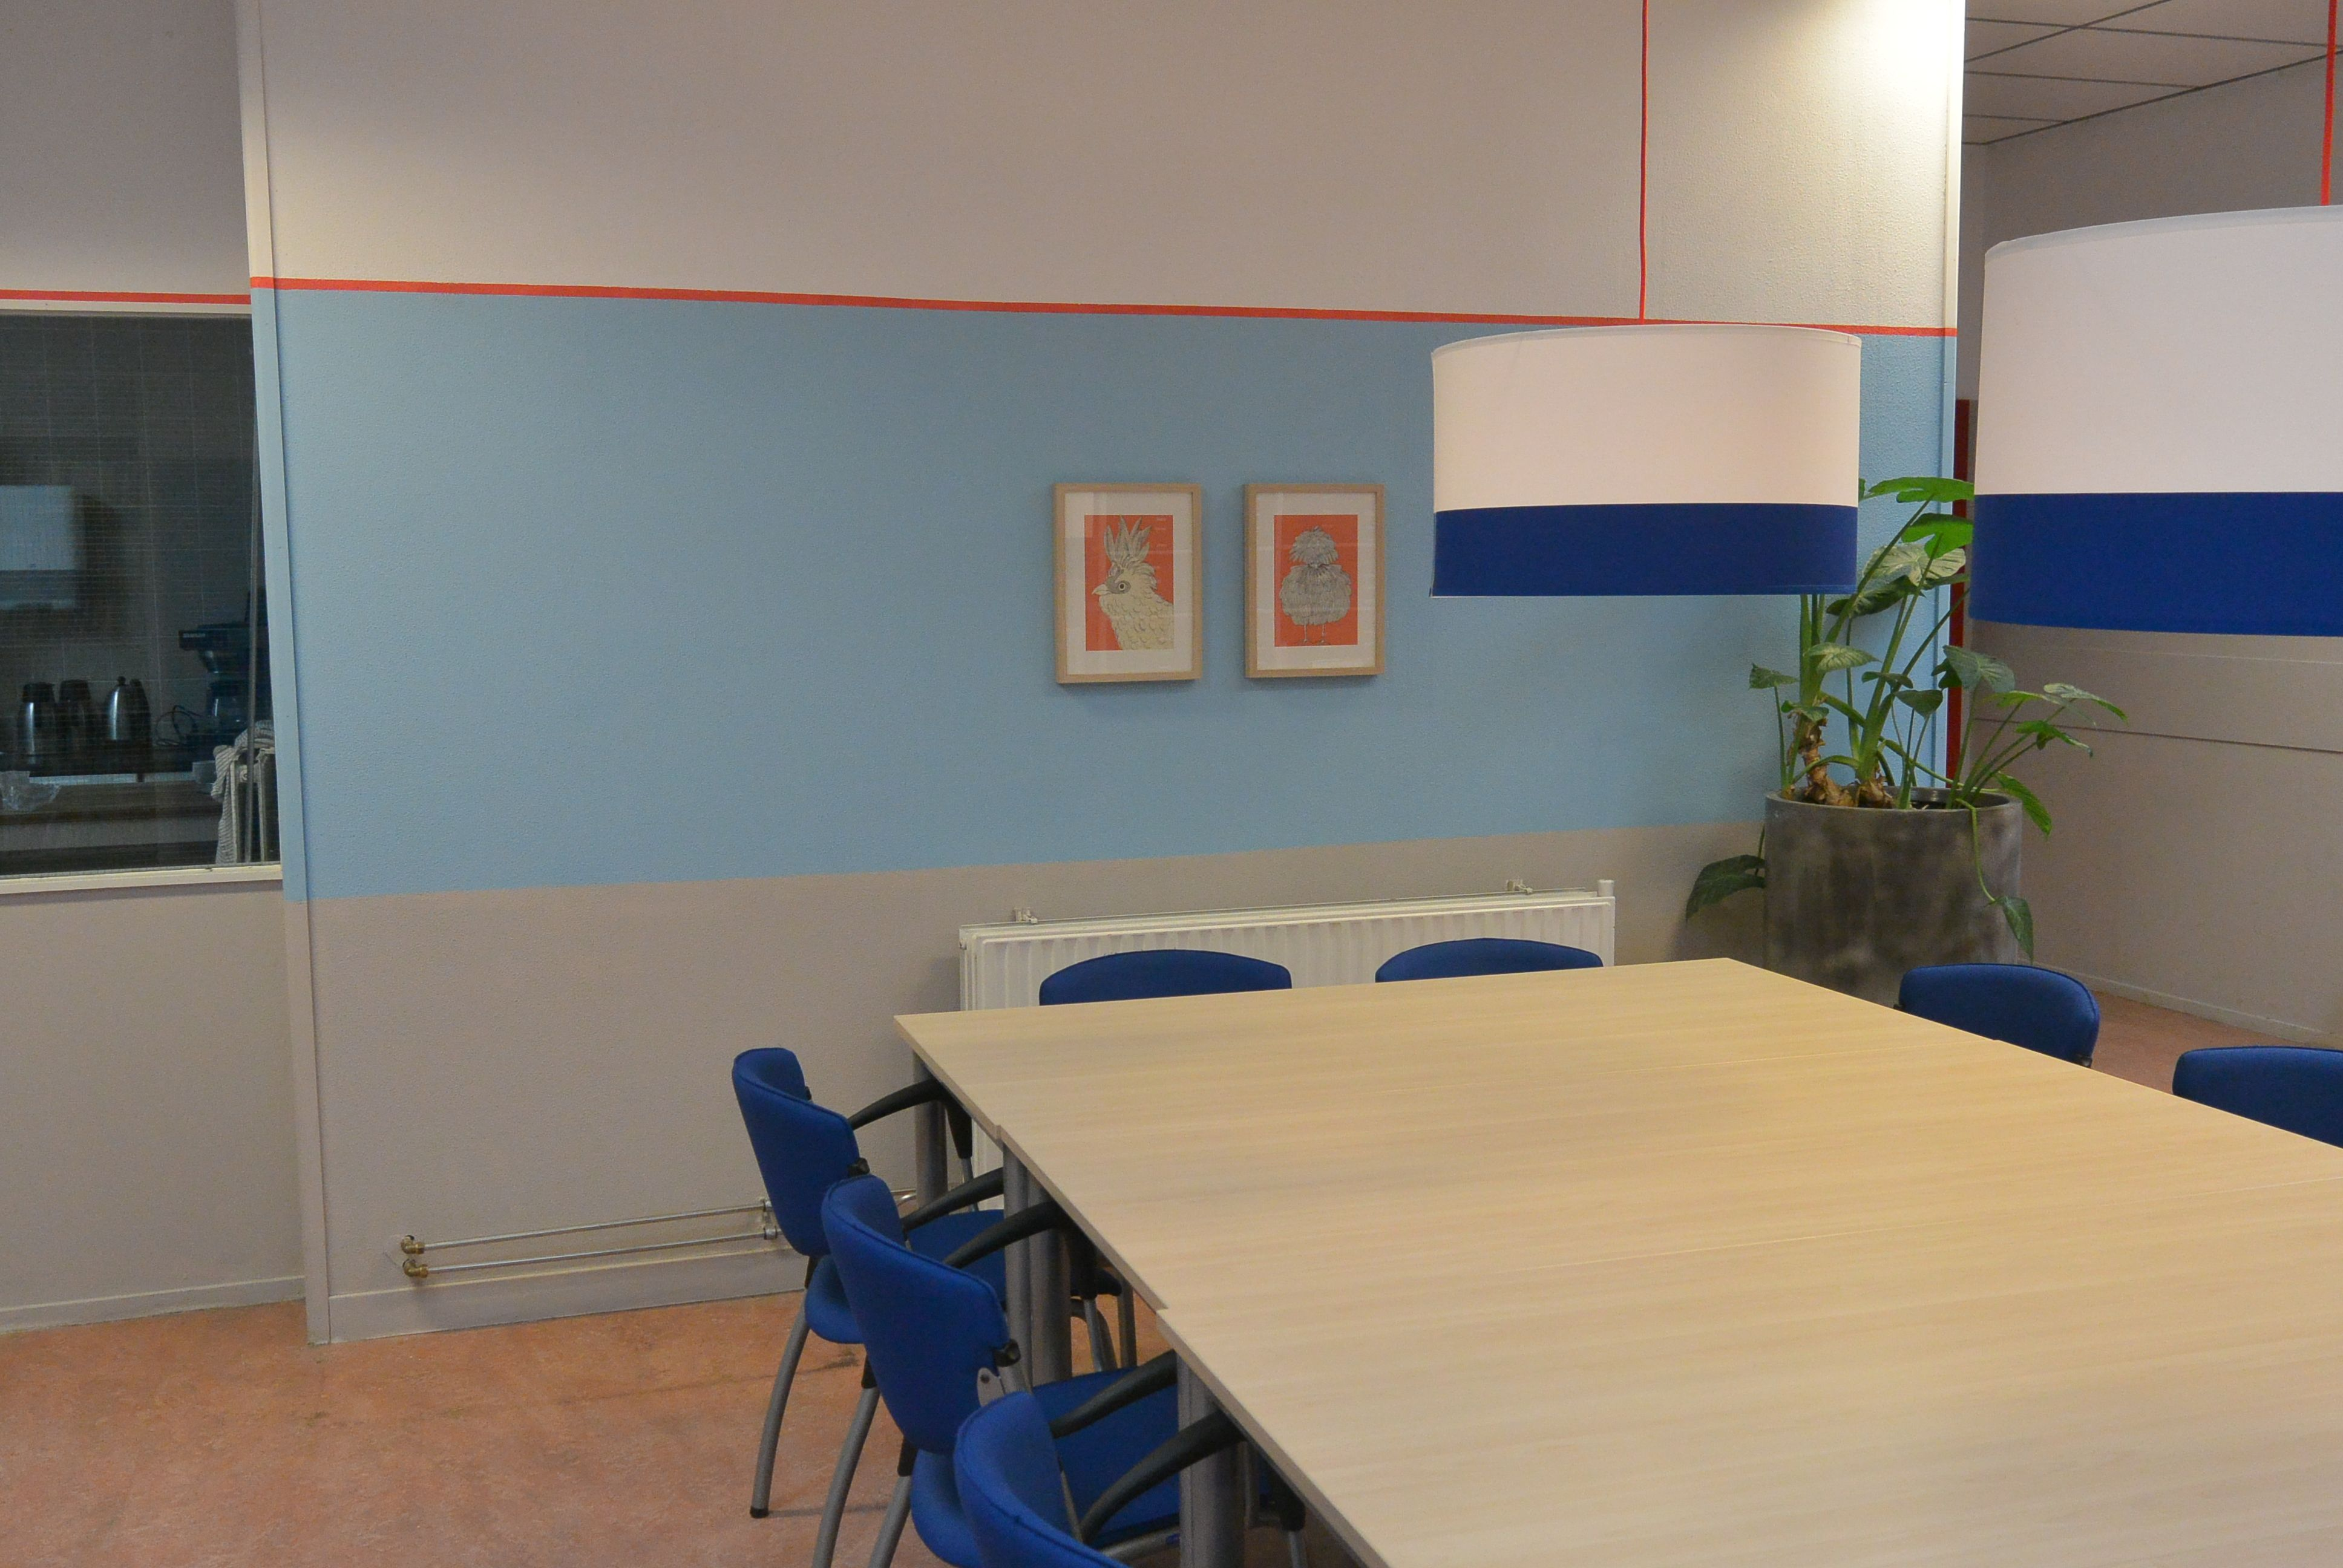 Lampen Ikea Tafel : Arbeitshöhe küche ikea schwebende küche mit ikea